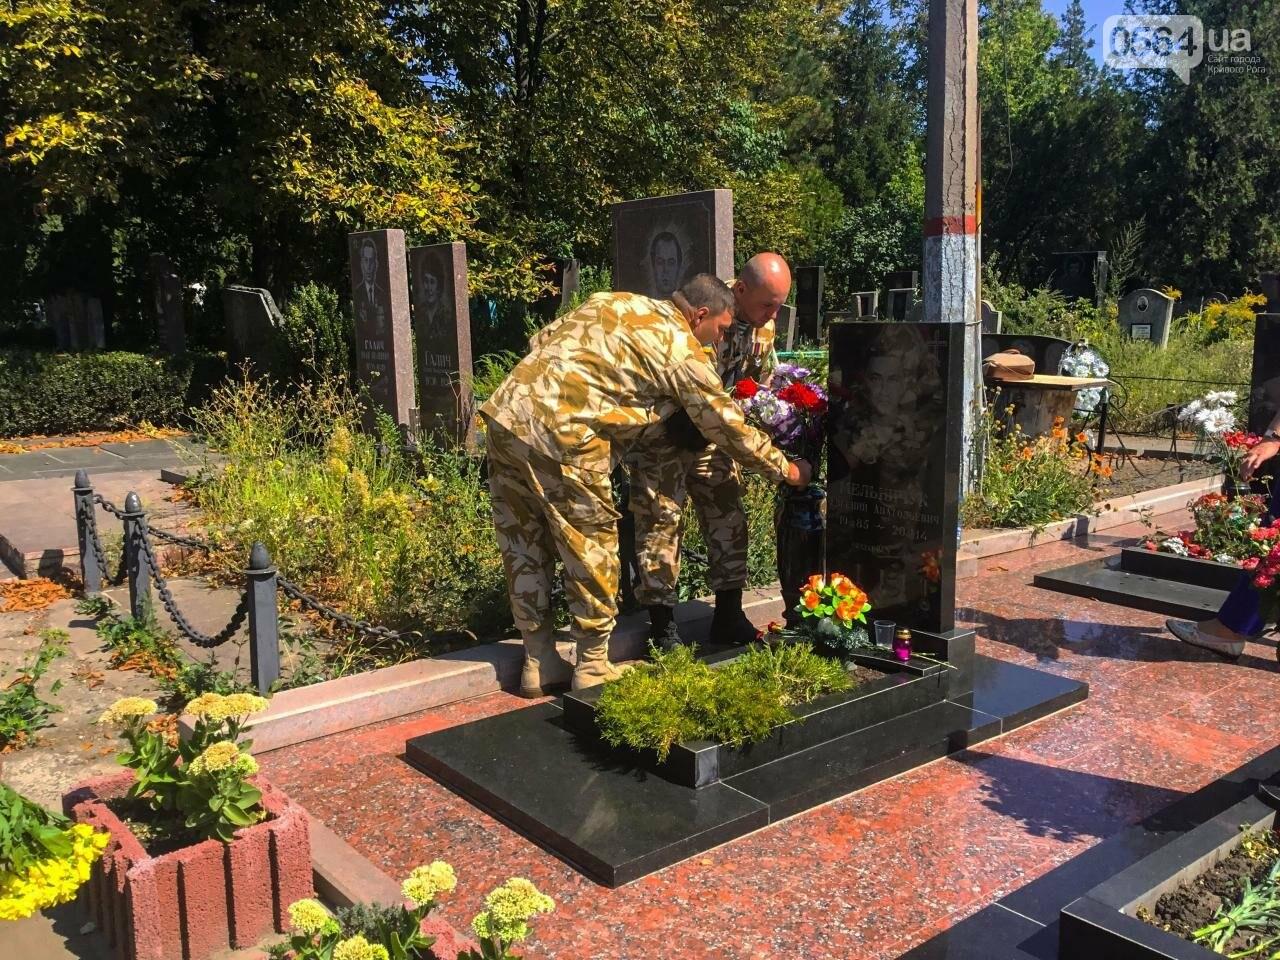 На Аллее Героев провели панихиду по погибшим в зоне АТО криворожанам, - ФОТО , фото-40